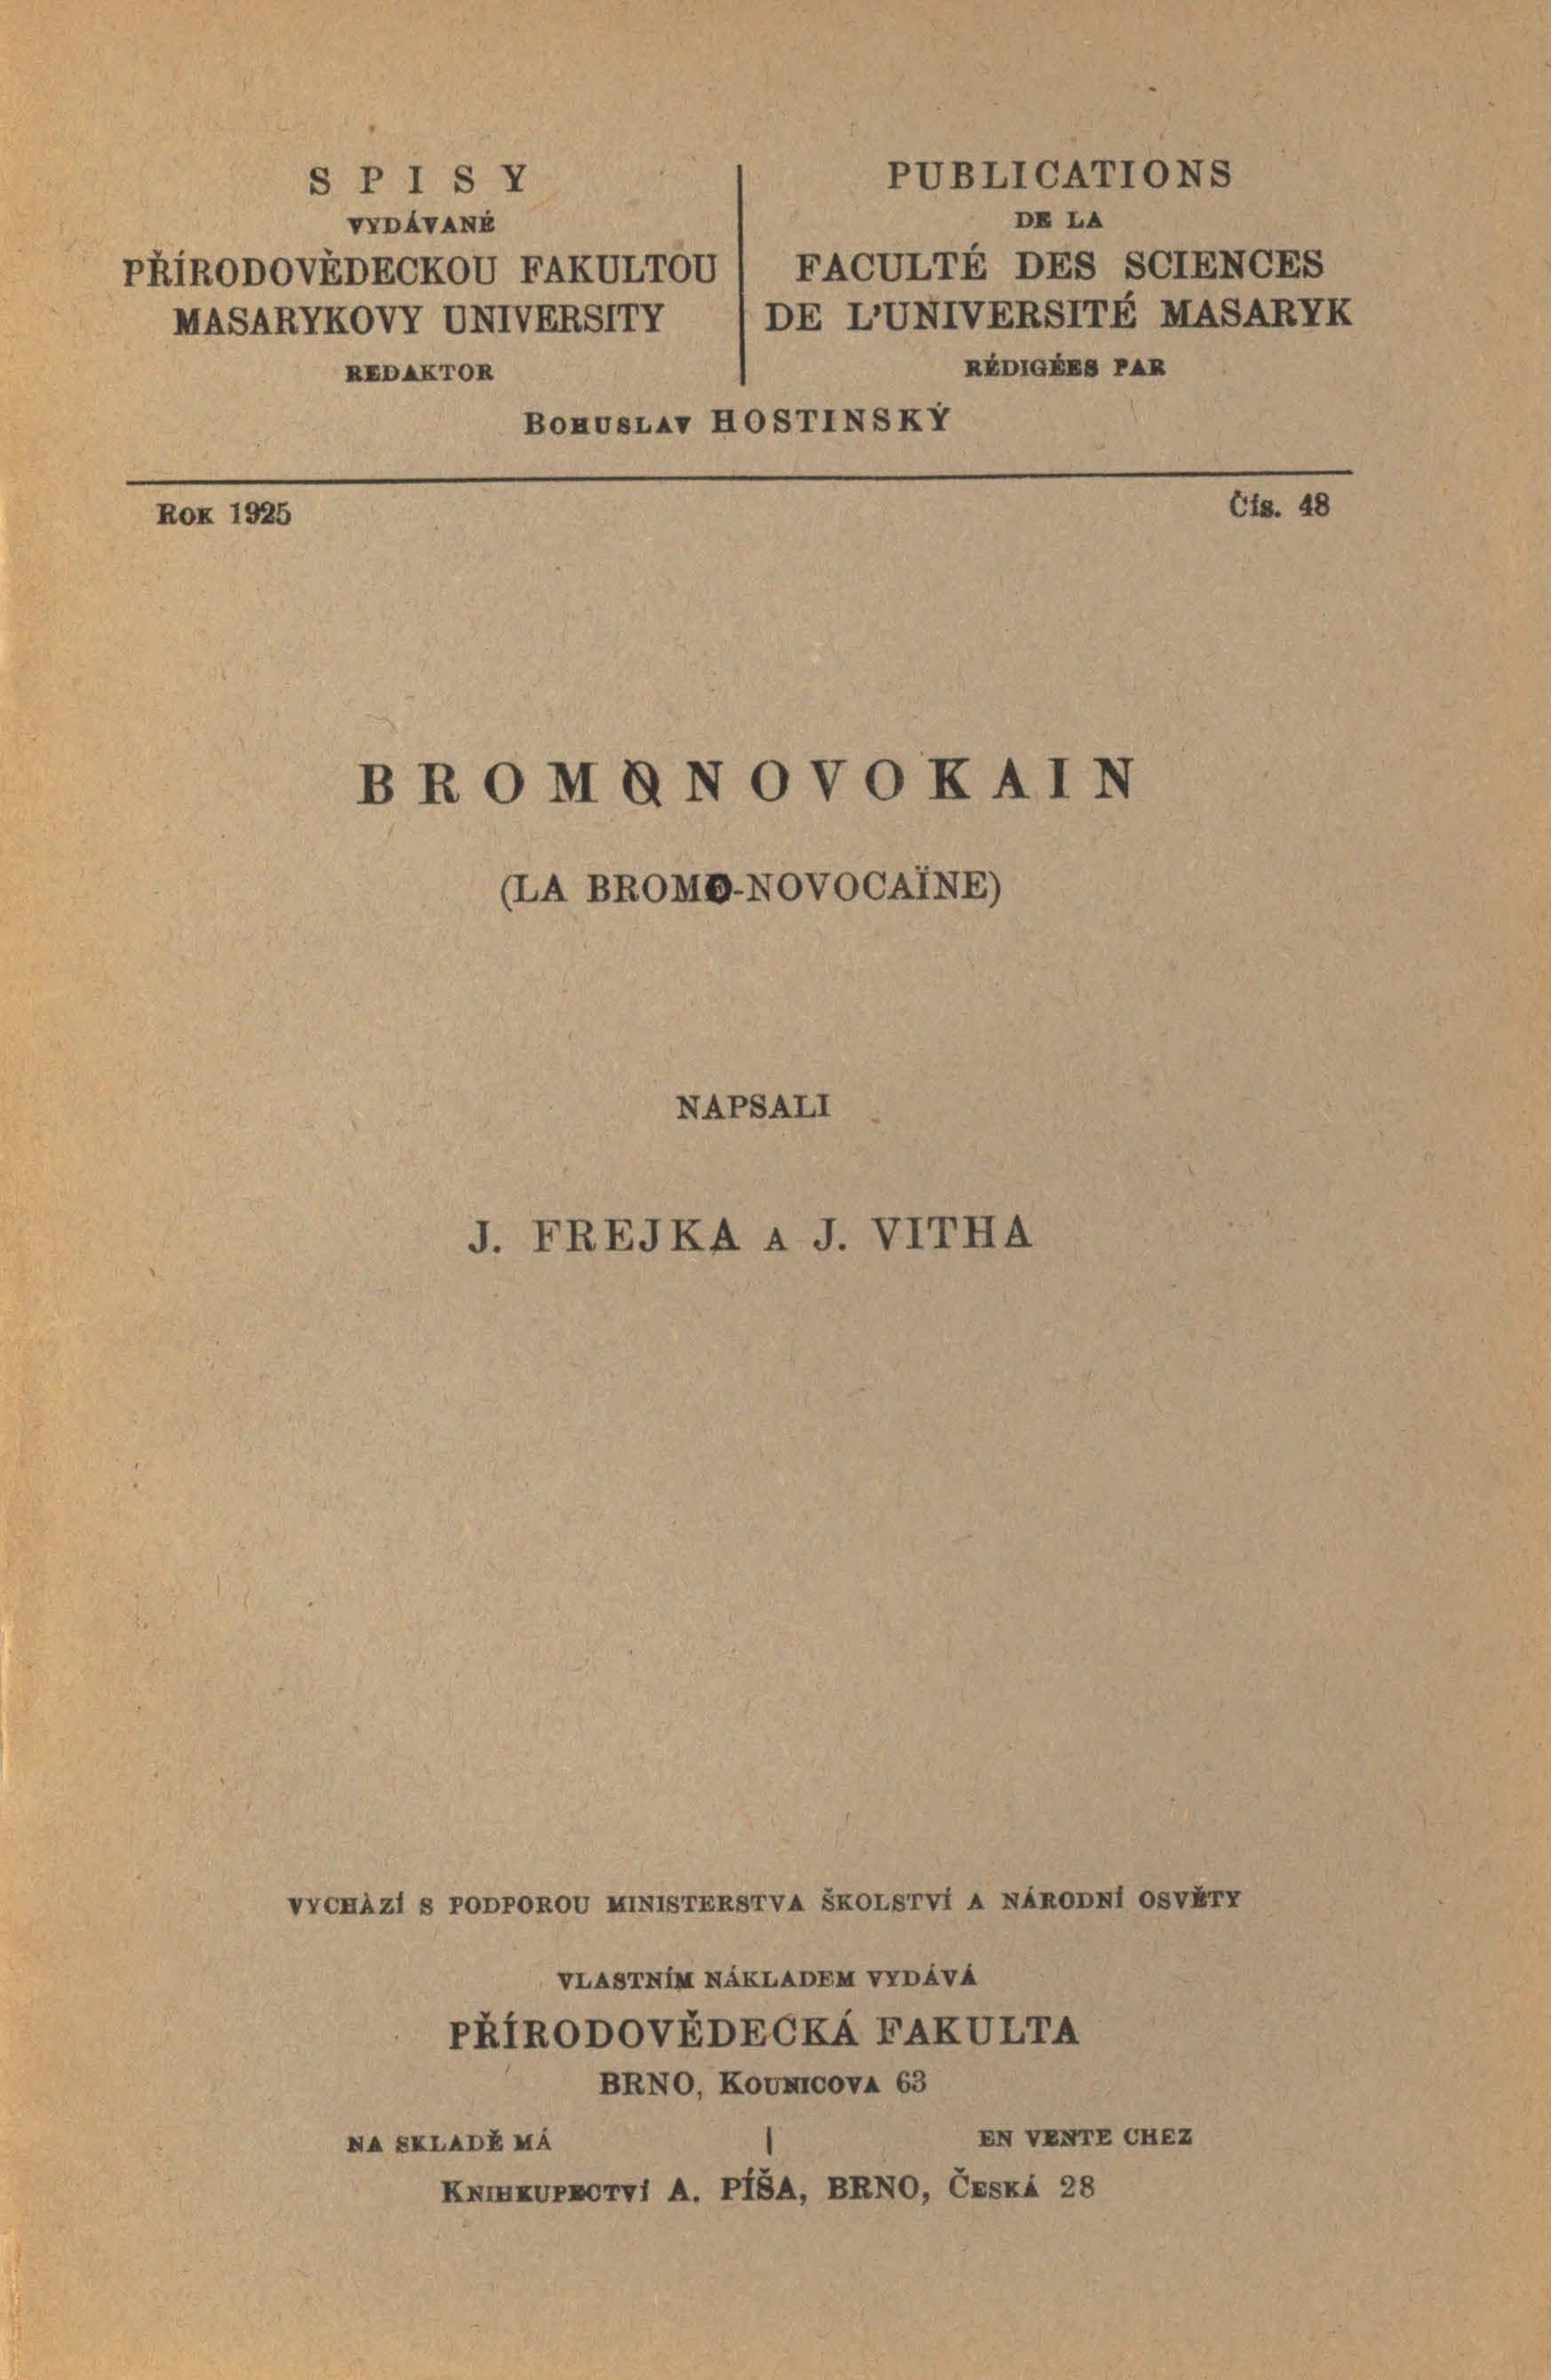 Obálka pro Bromonovokain